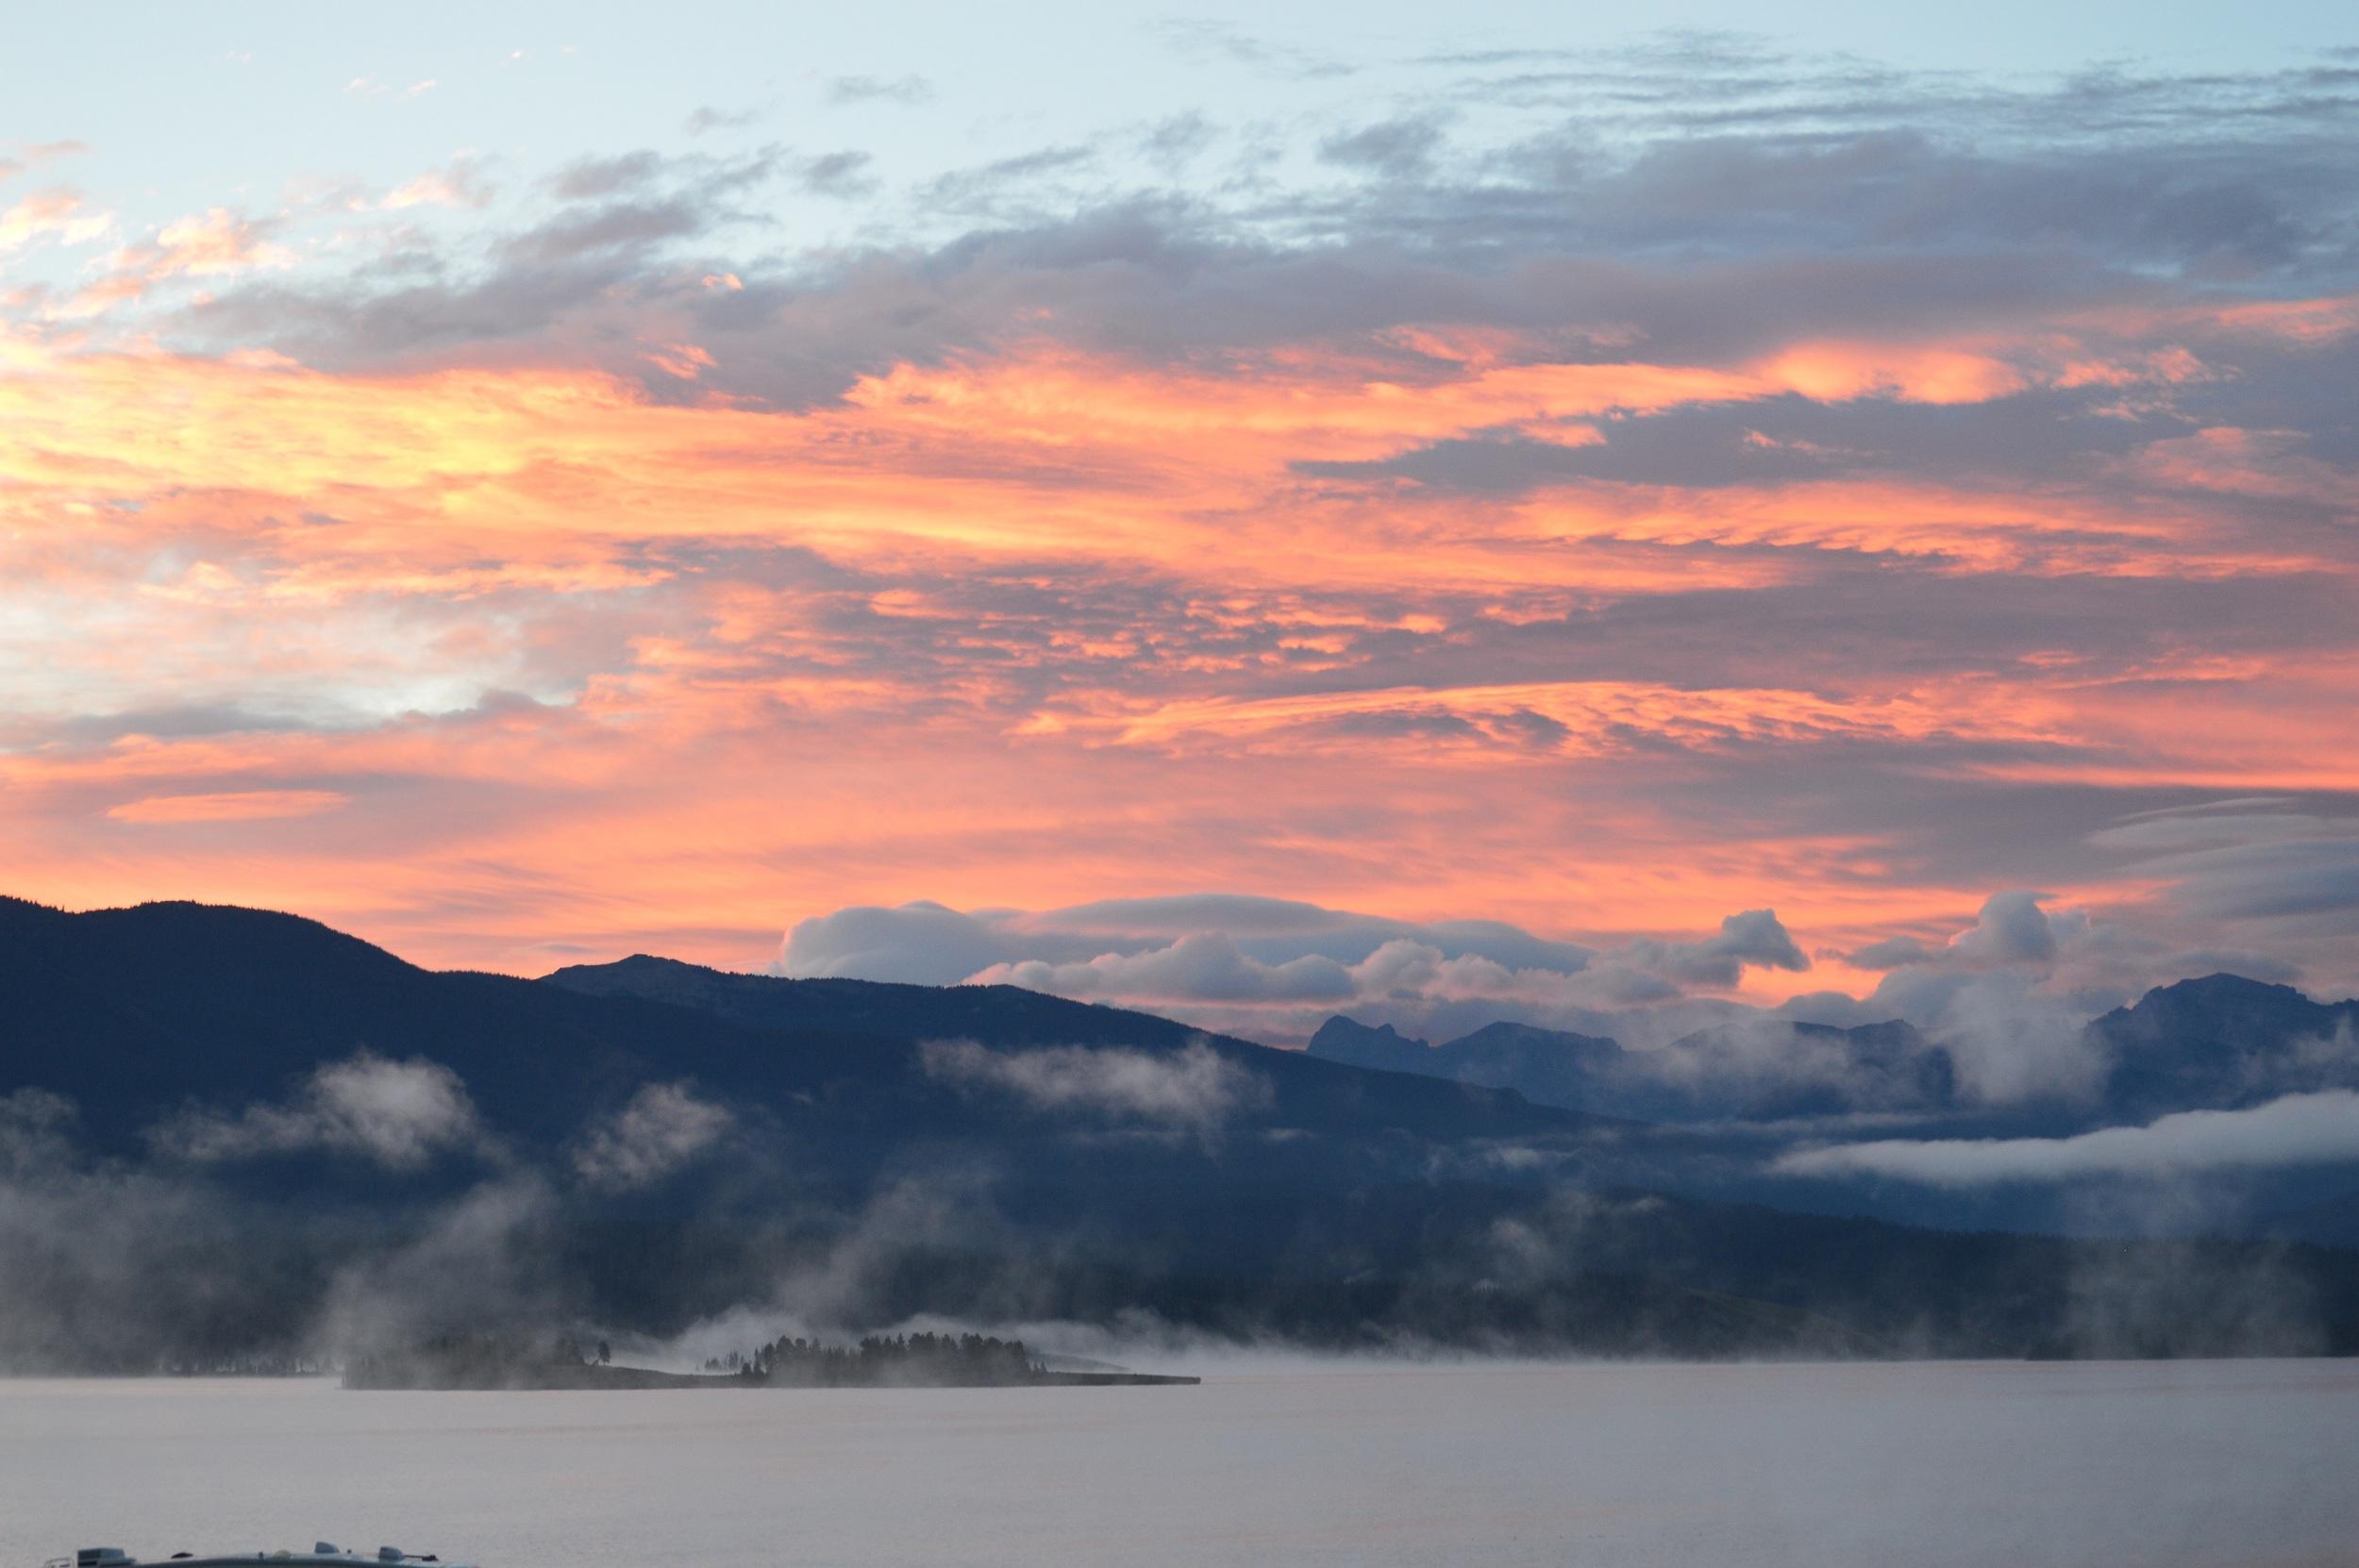 Foggy sunrise over Lake Granby